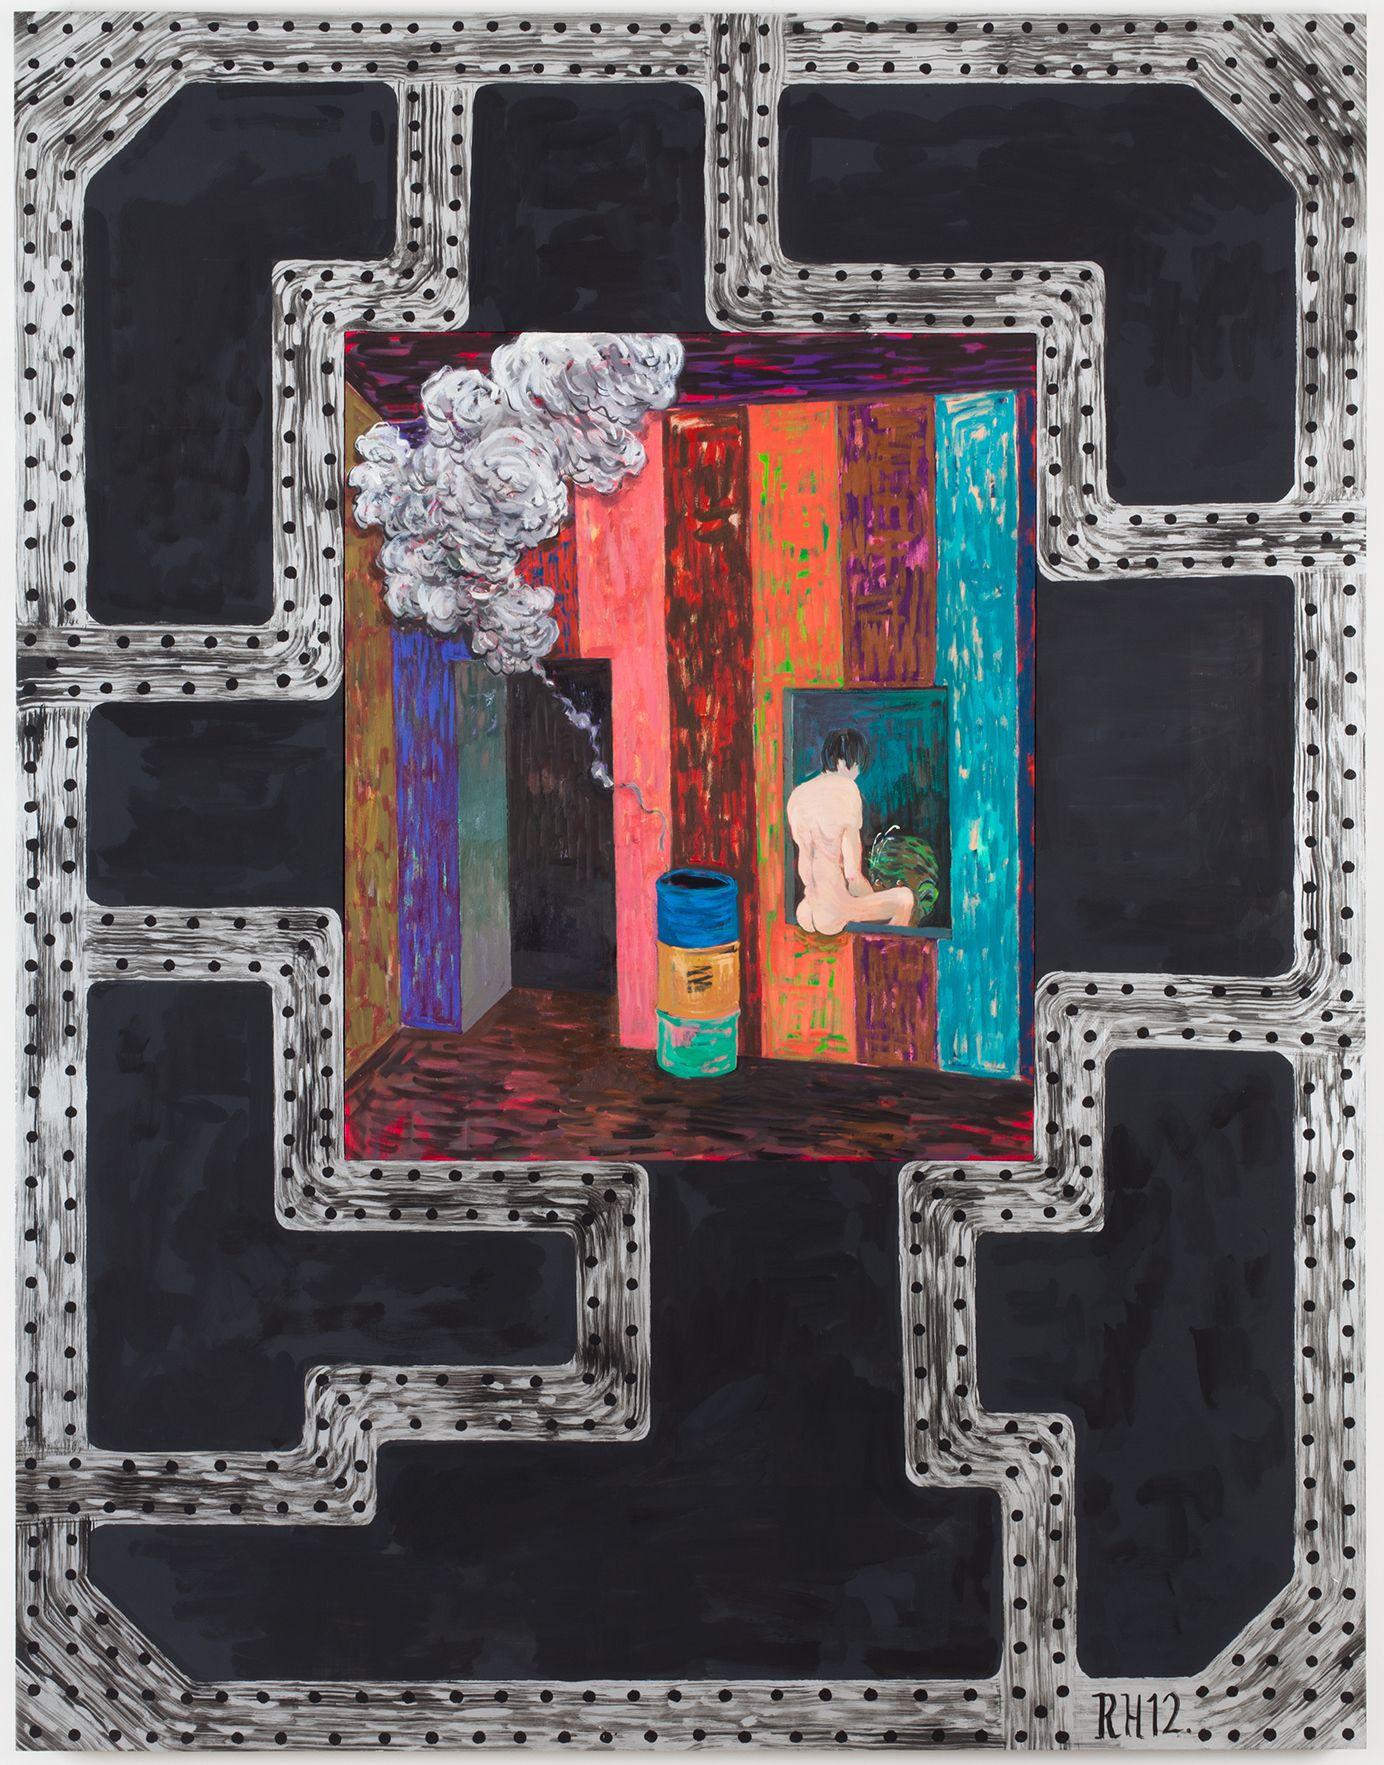 Richard Hawkins Brig #6: Overshot, 2012 Oil on canvas and acrylic on panel 63 x 49 x 1 5/8 inches 160 x 124.5 x 4.1 cm